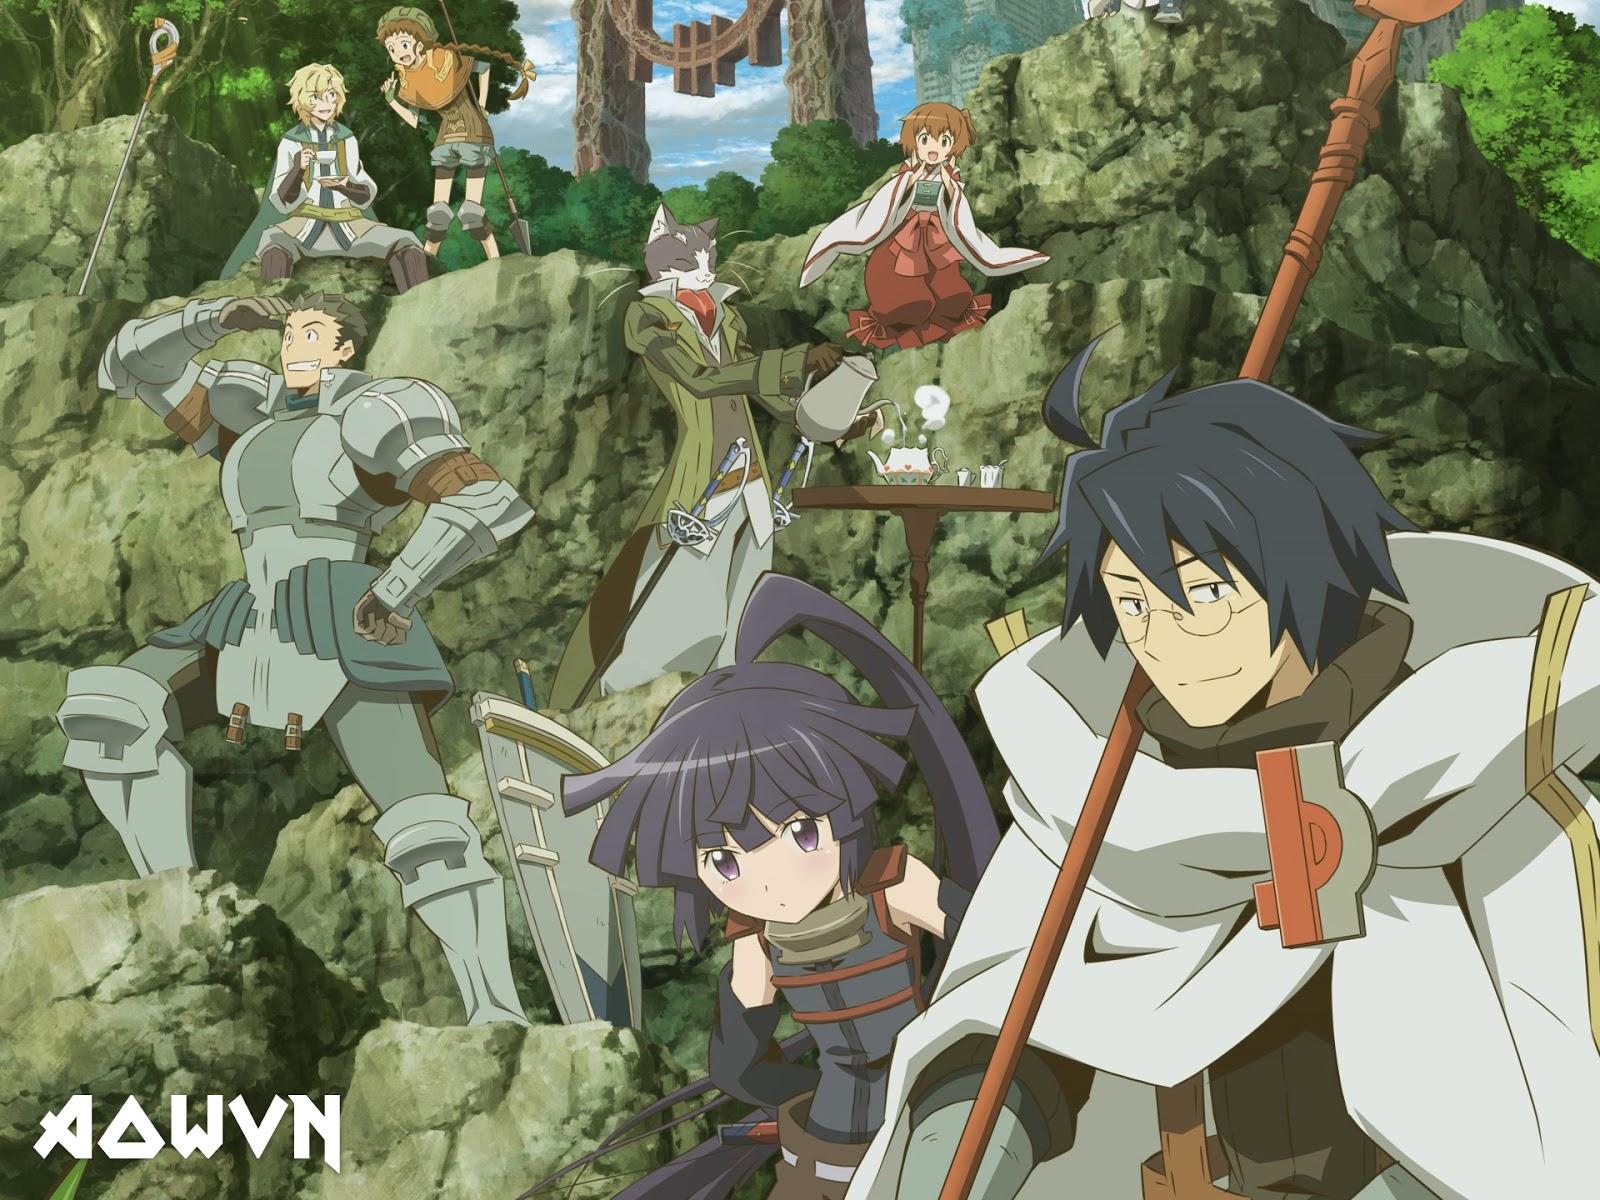 aowvn.org log horizon%2B%25282%2529 - [ Anime 3gp Mp4 ] Log Horizon SS1 + SS2 | Vietsub - Tuyệt Hay